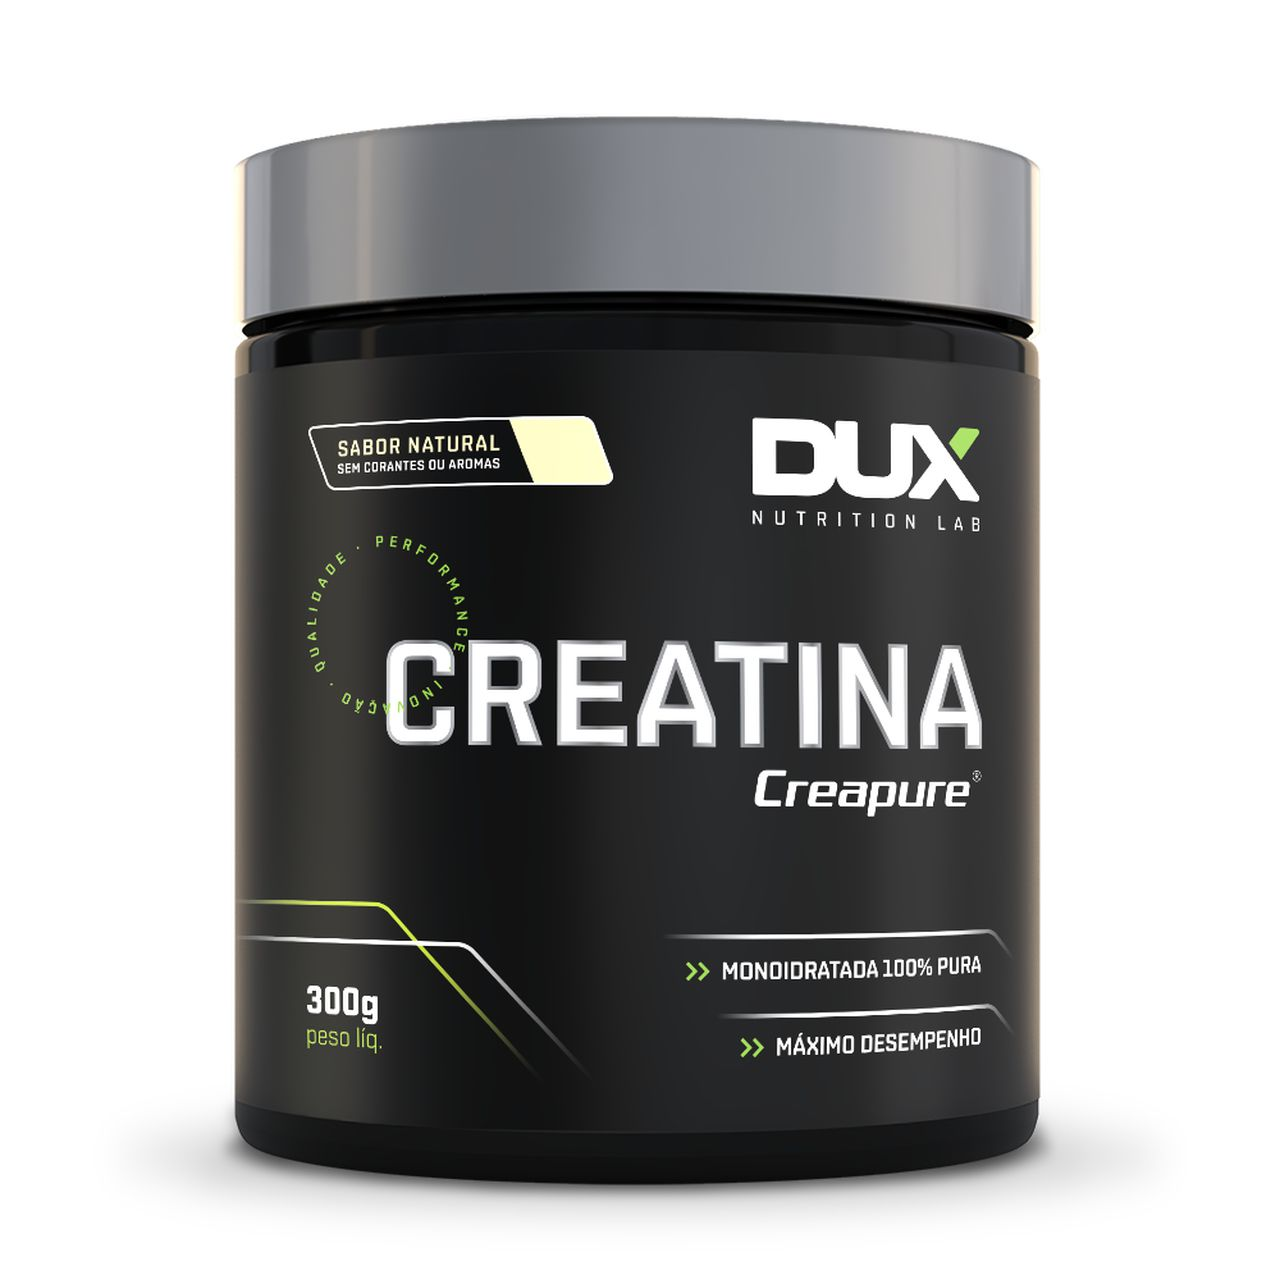 Creatina Creapure (300g) - Dux Nutrition